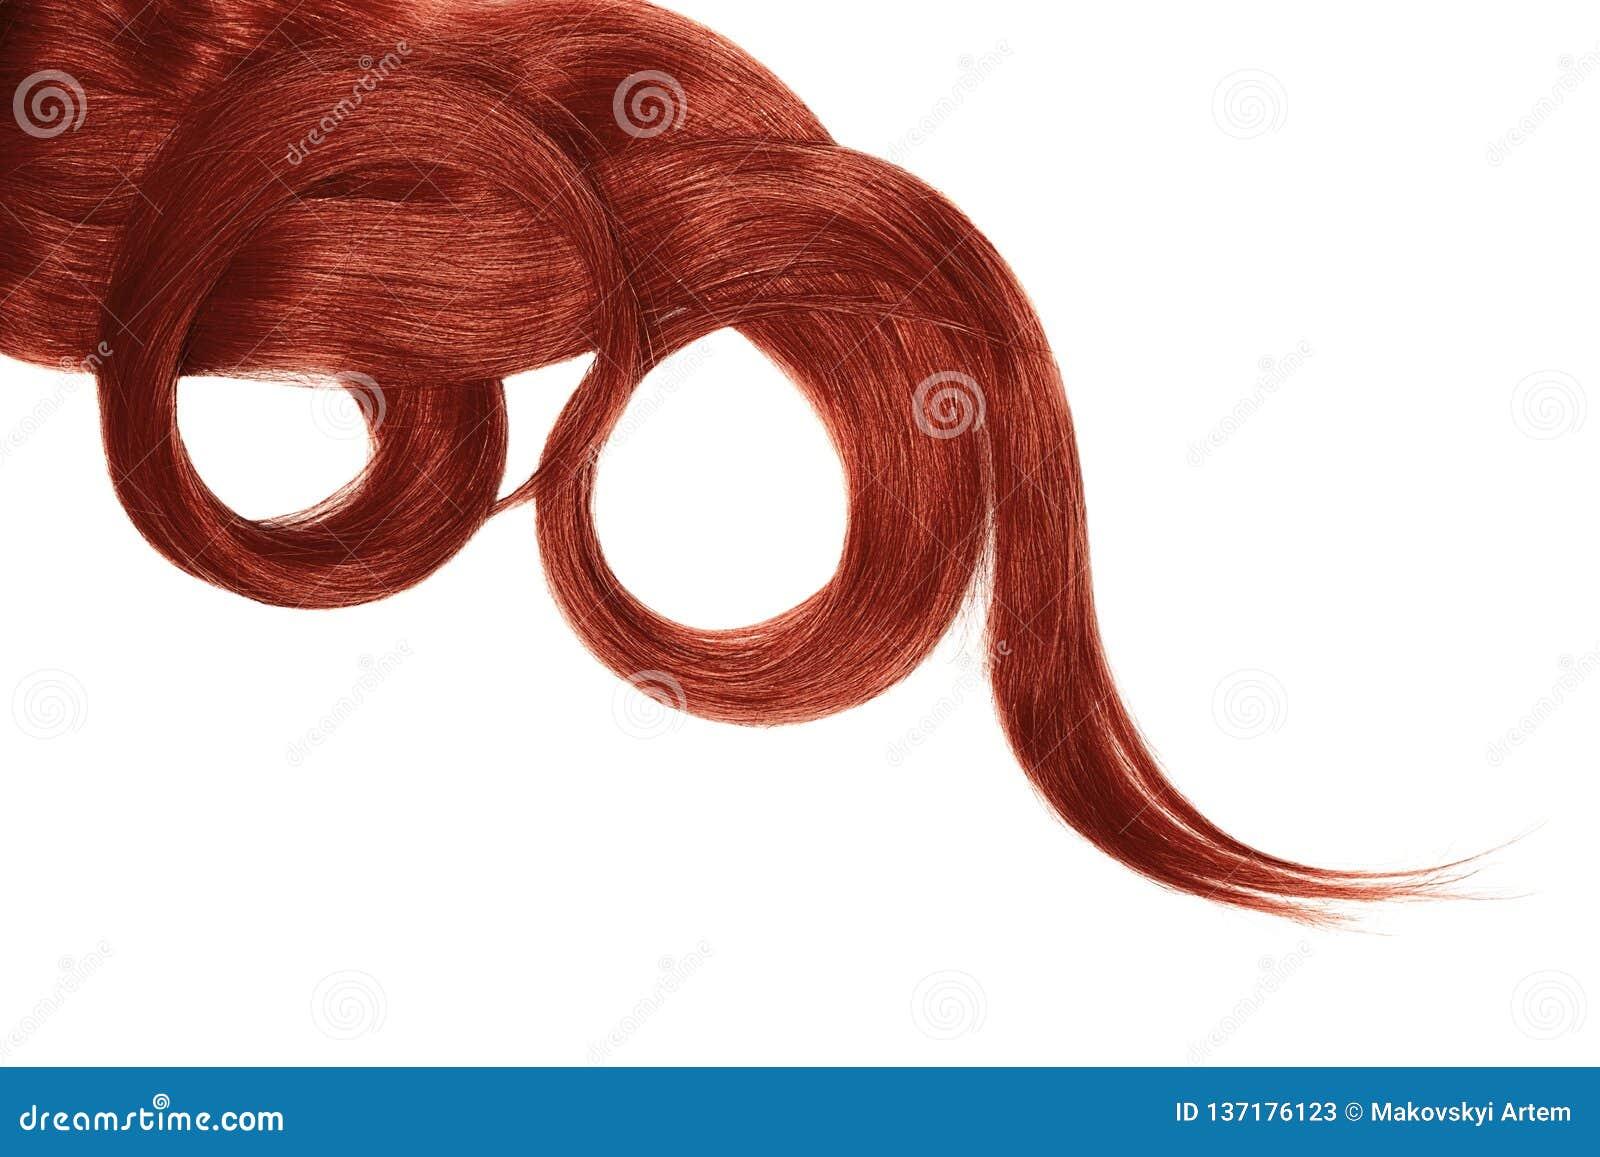 Cabelo vermelho isolado no fundo branco Rabo de cavalo bonito longo na forma do círculo